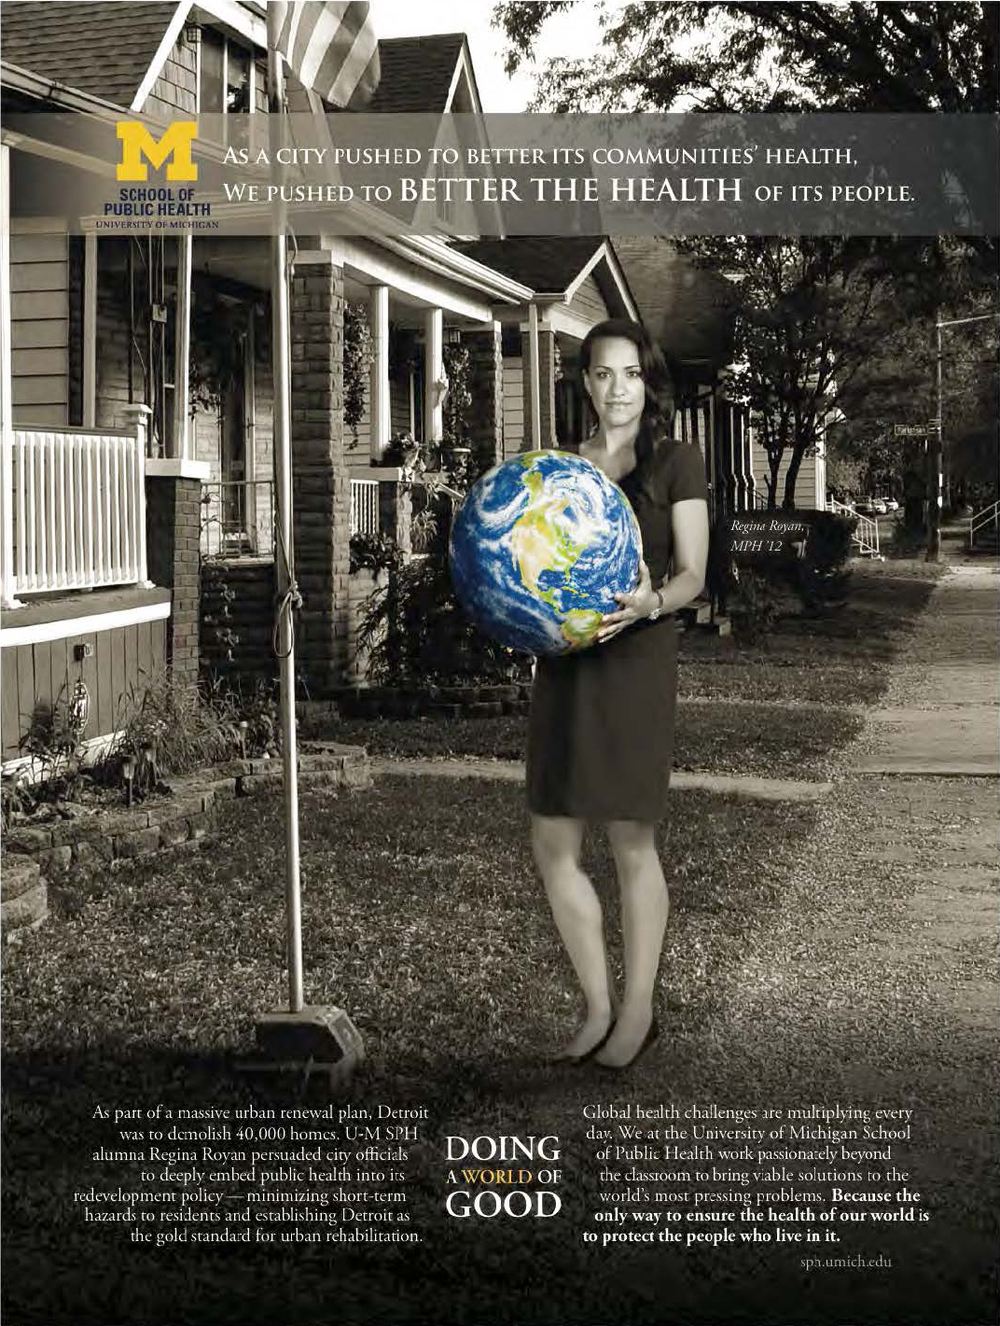 U of M School of Public Health-Time Magazine